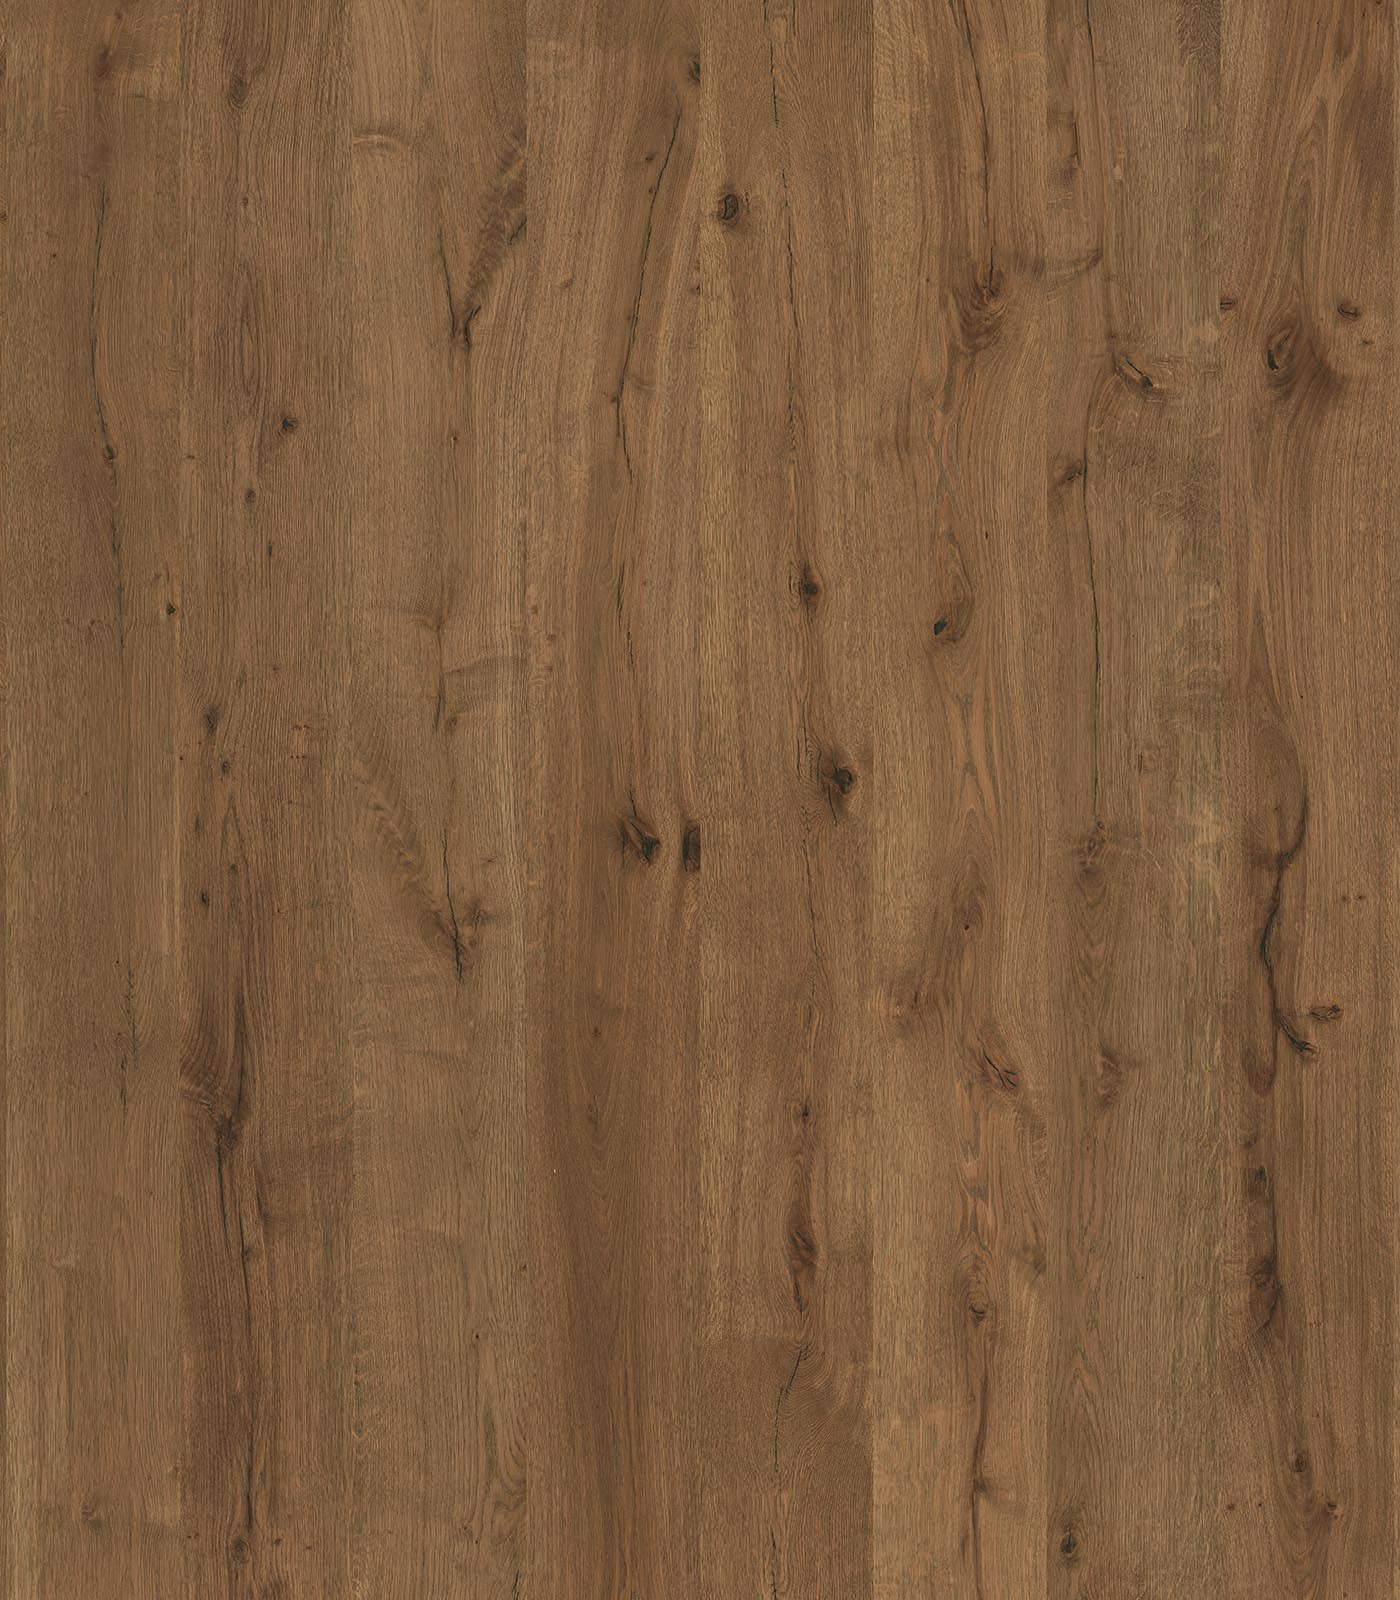 Hayward-Variante Collection-European Oak floors-flat